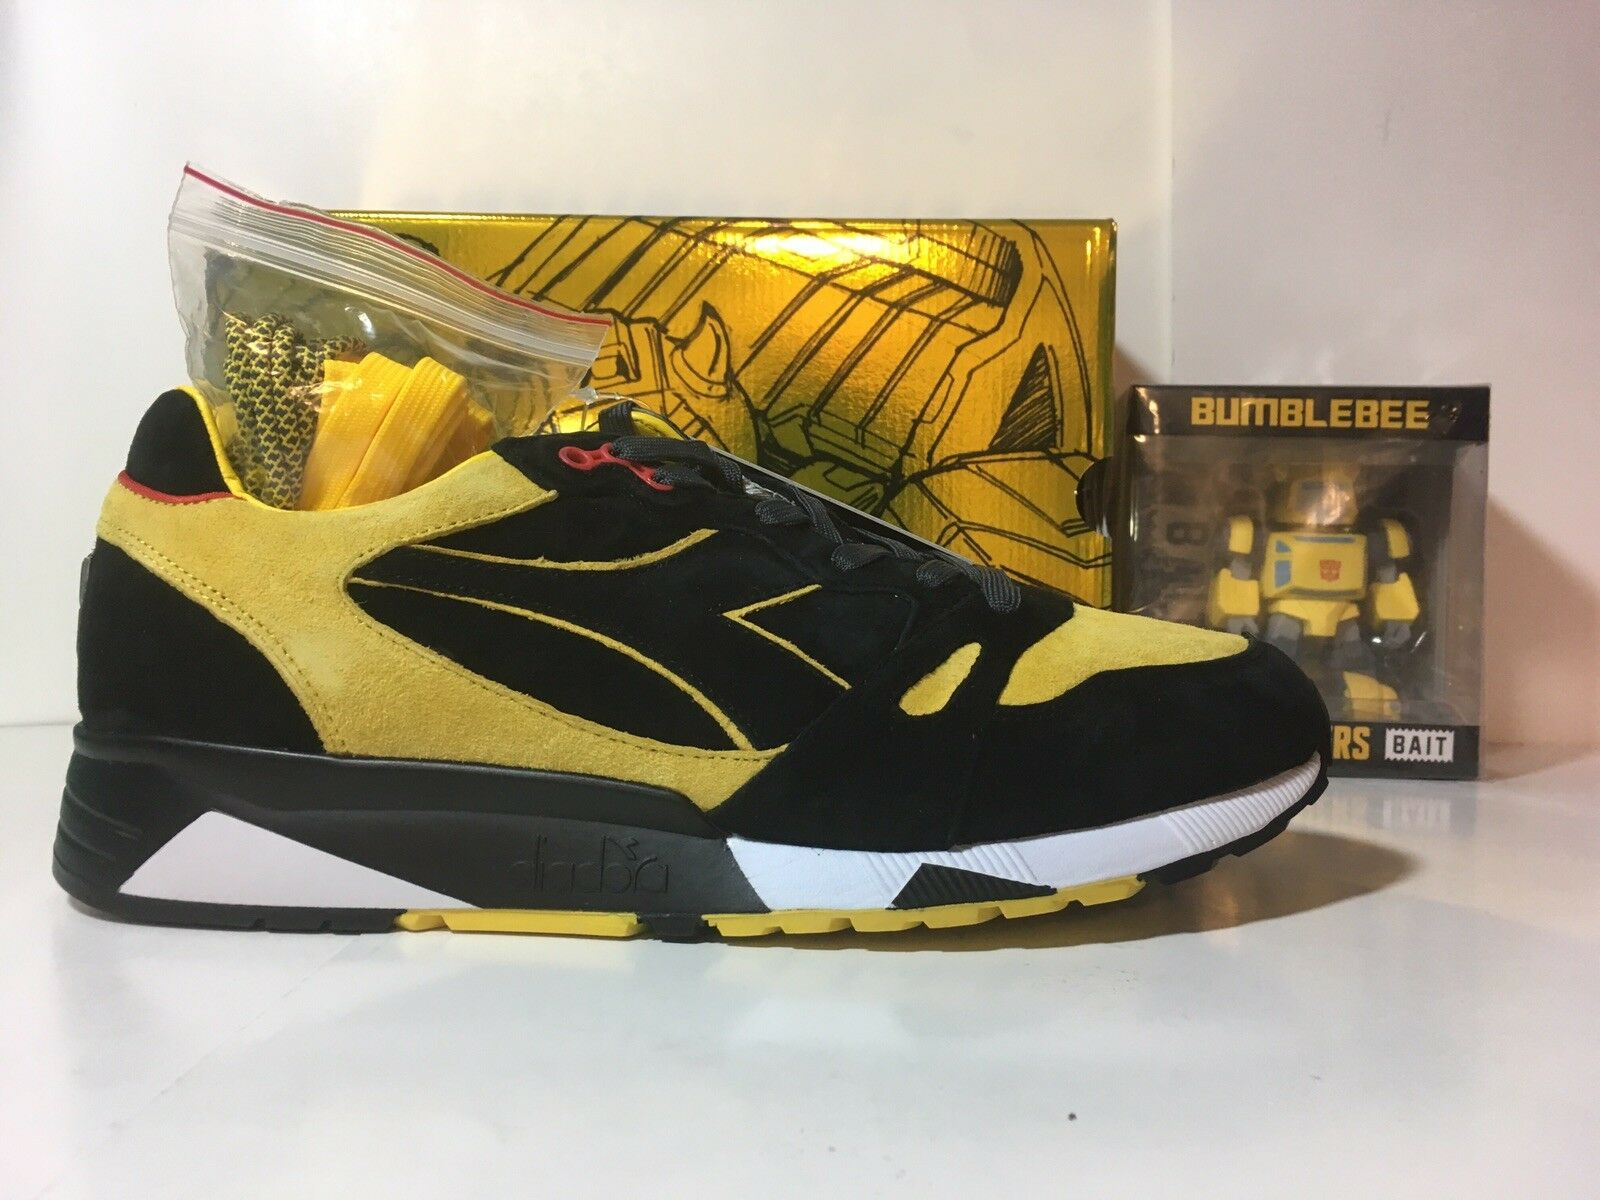 BAIT x Transformers x Diadora Men S8000 Bumblebee Size 12 FIGURE CONFIRMED